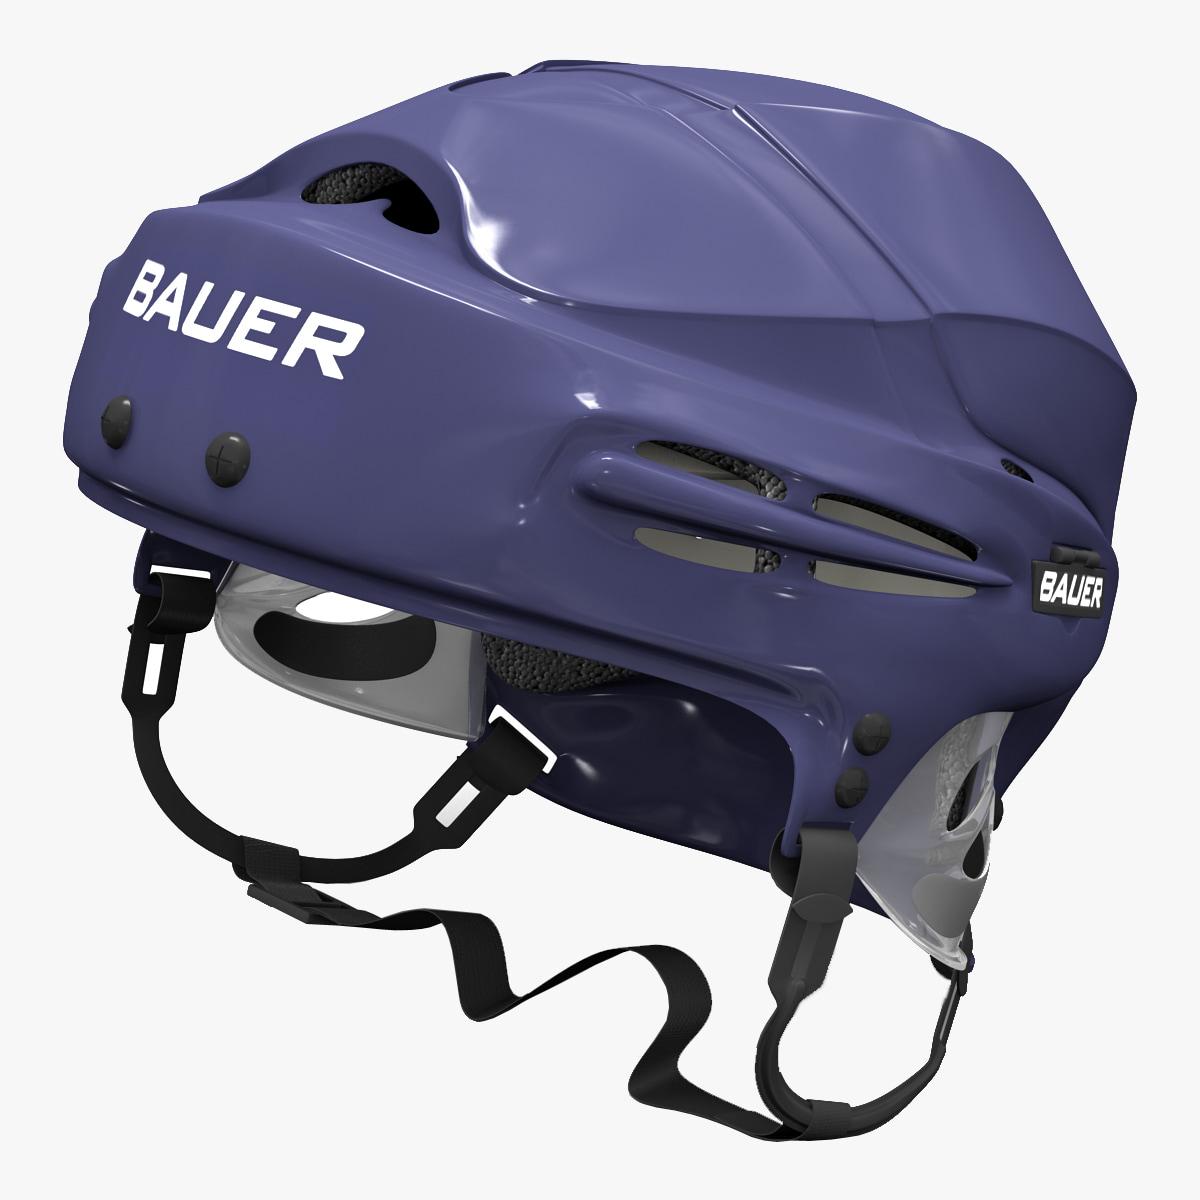 Hockey_Helmet_Bauer_5100_000.jpg